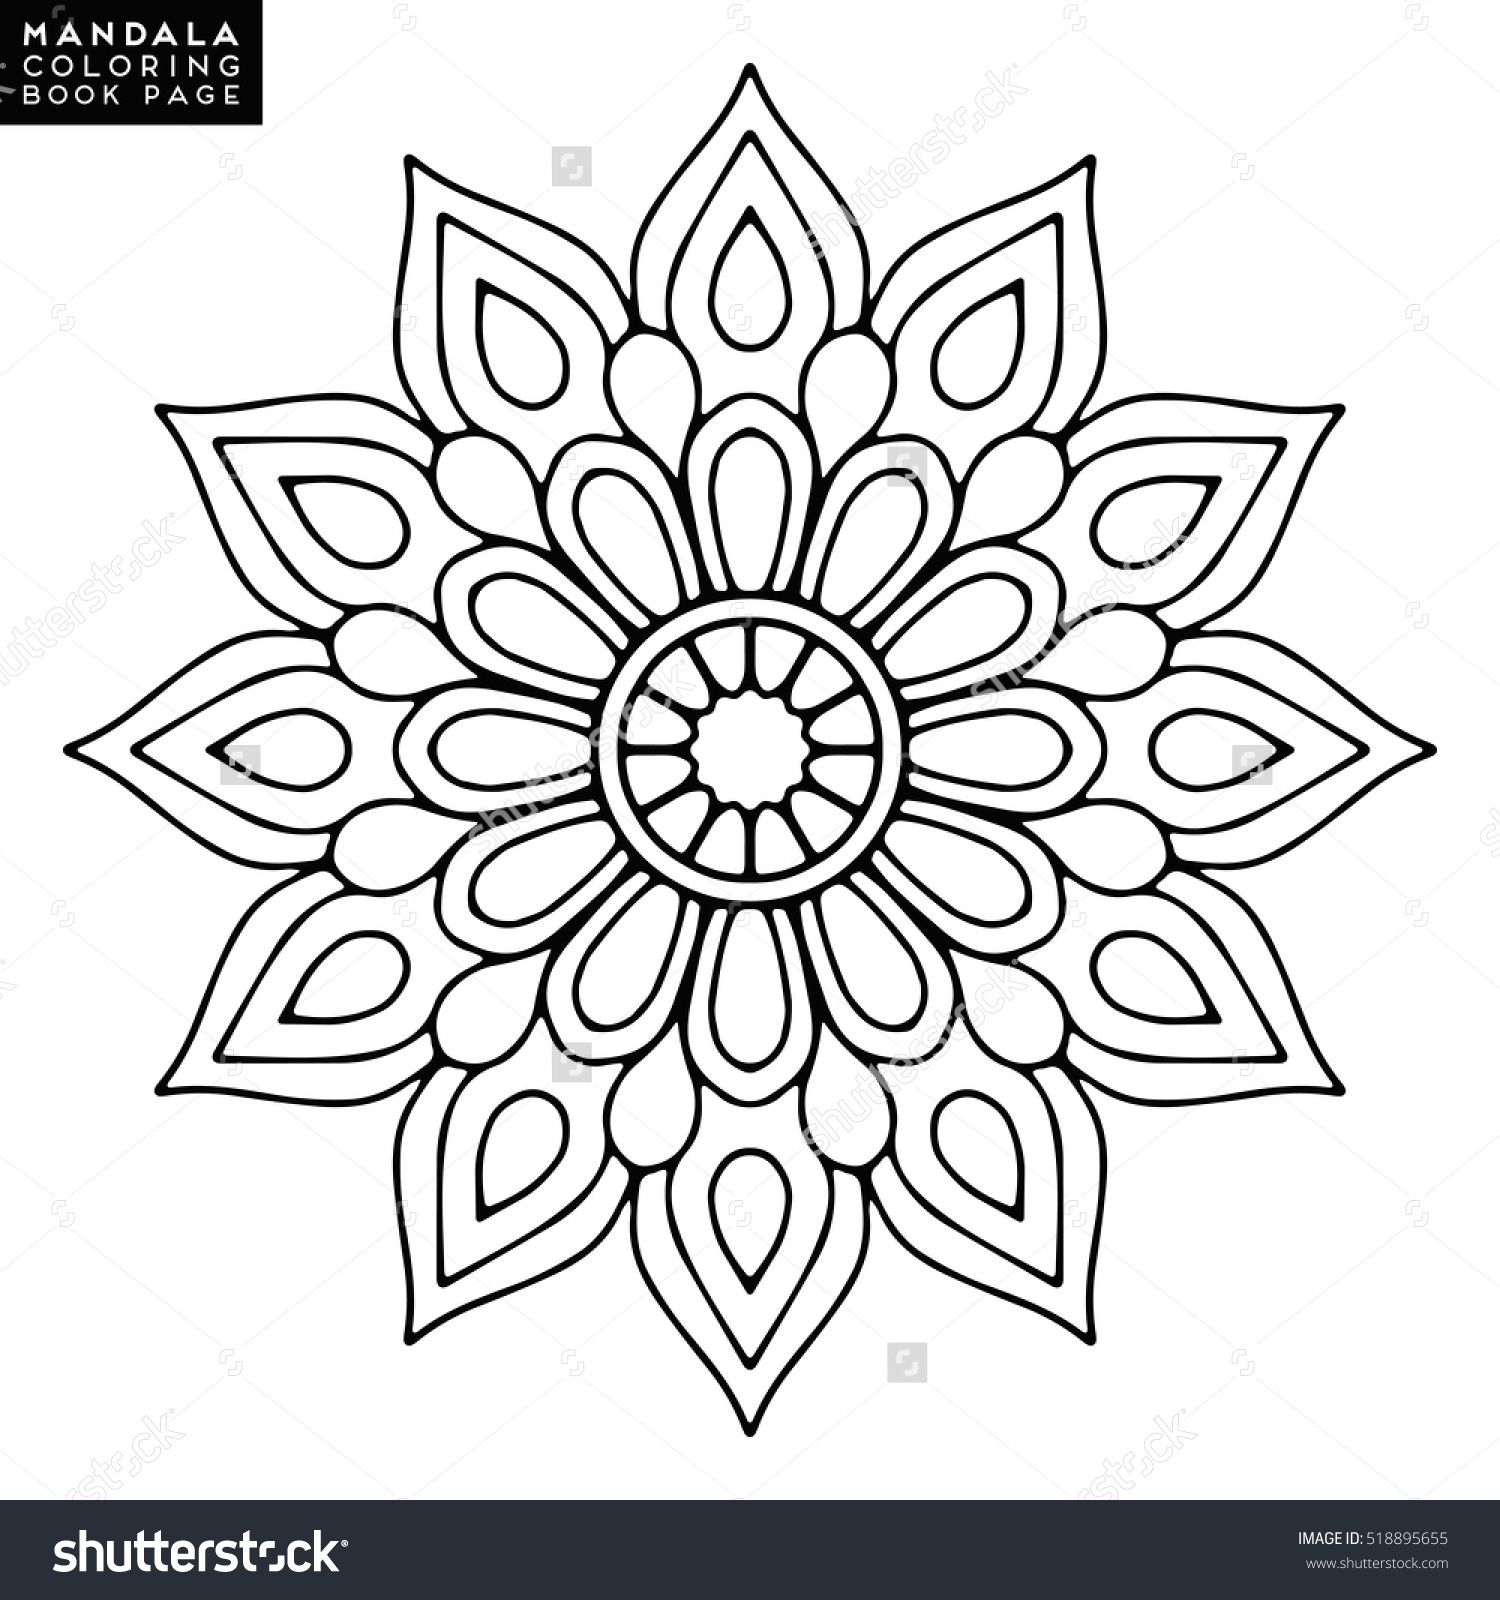 Chinese mandala coloring pages - Flower Mandala Vintage Decorative Elements Oriental Pattern Vector Illustration Islam Arabic